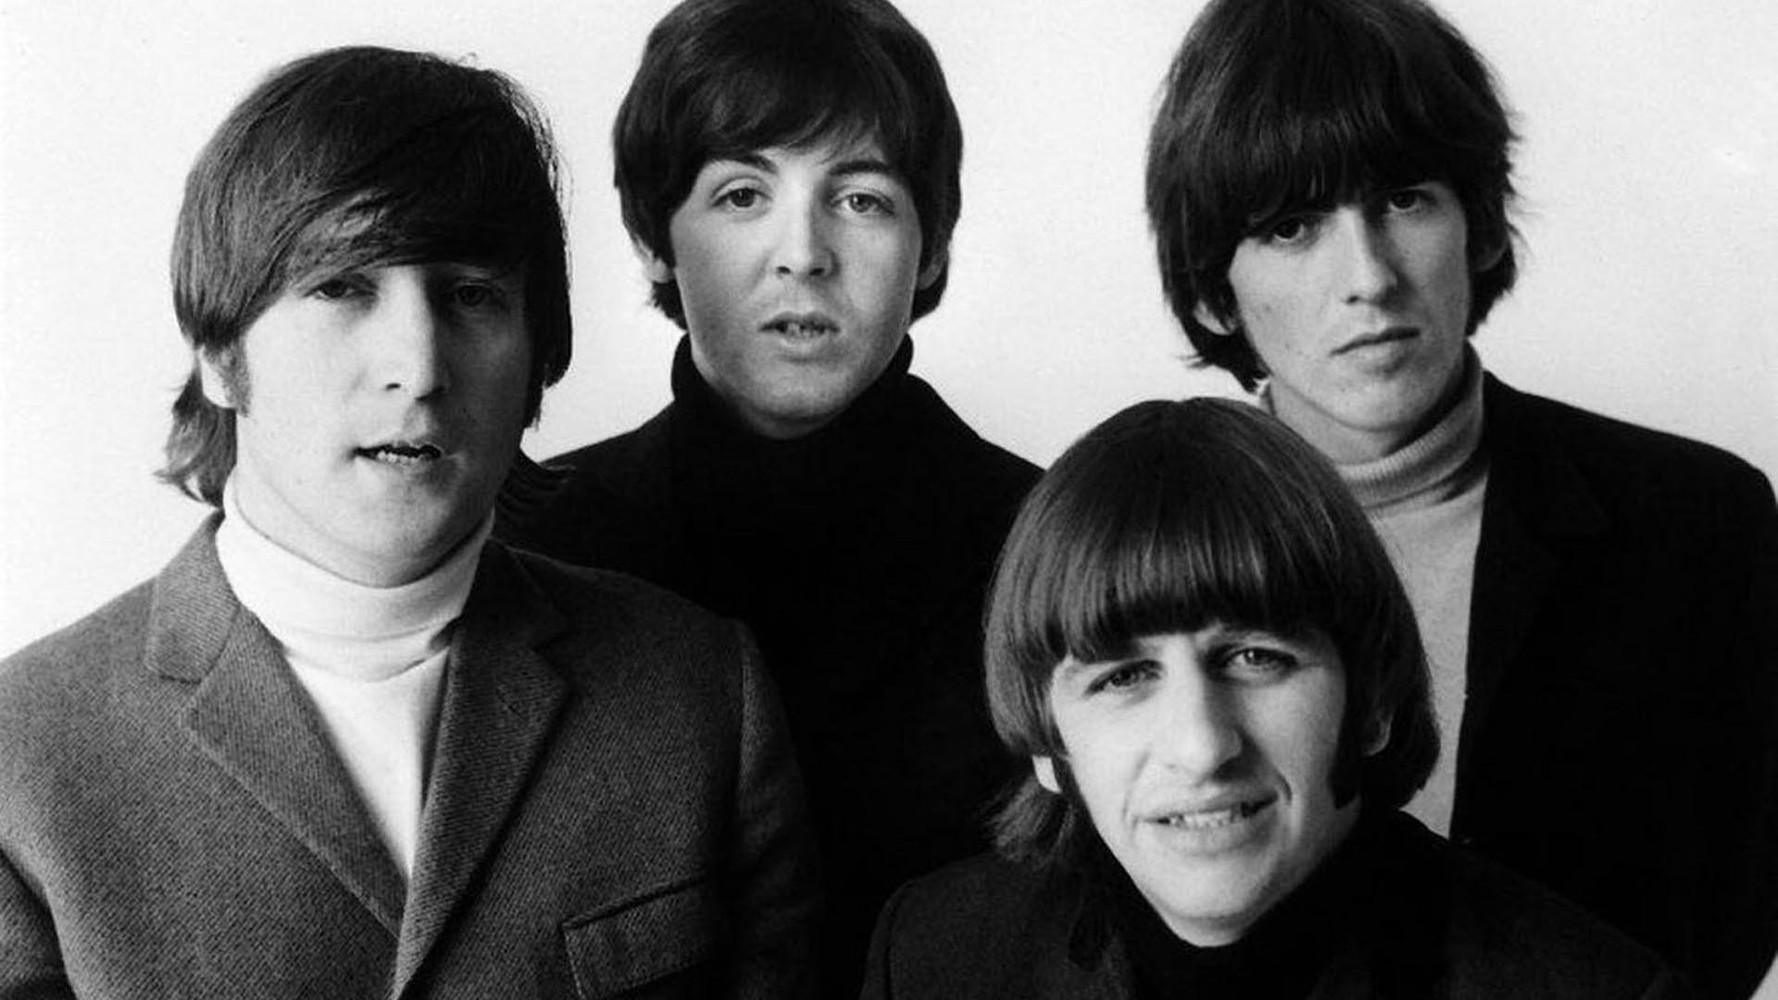 Феномен успеха: 10 причин величия «The Beatles»